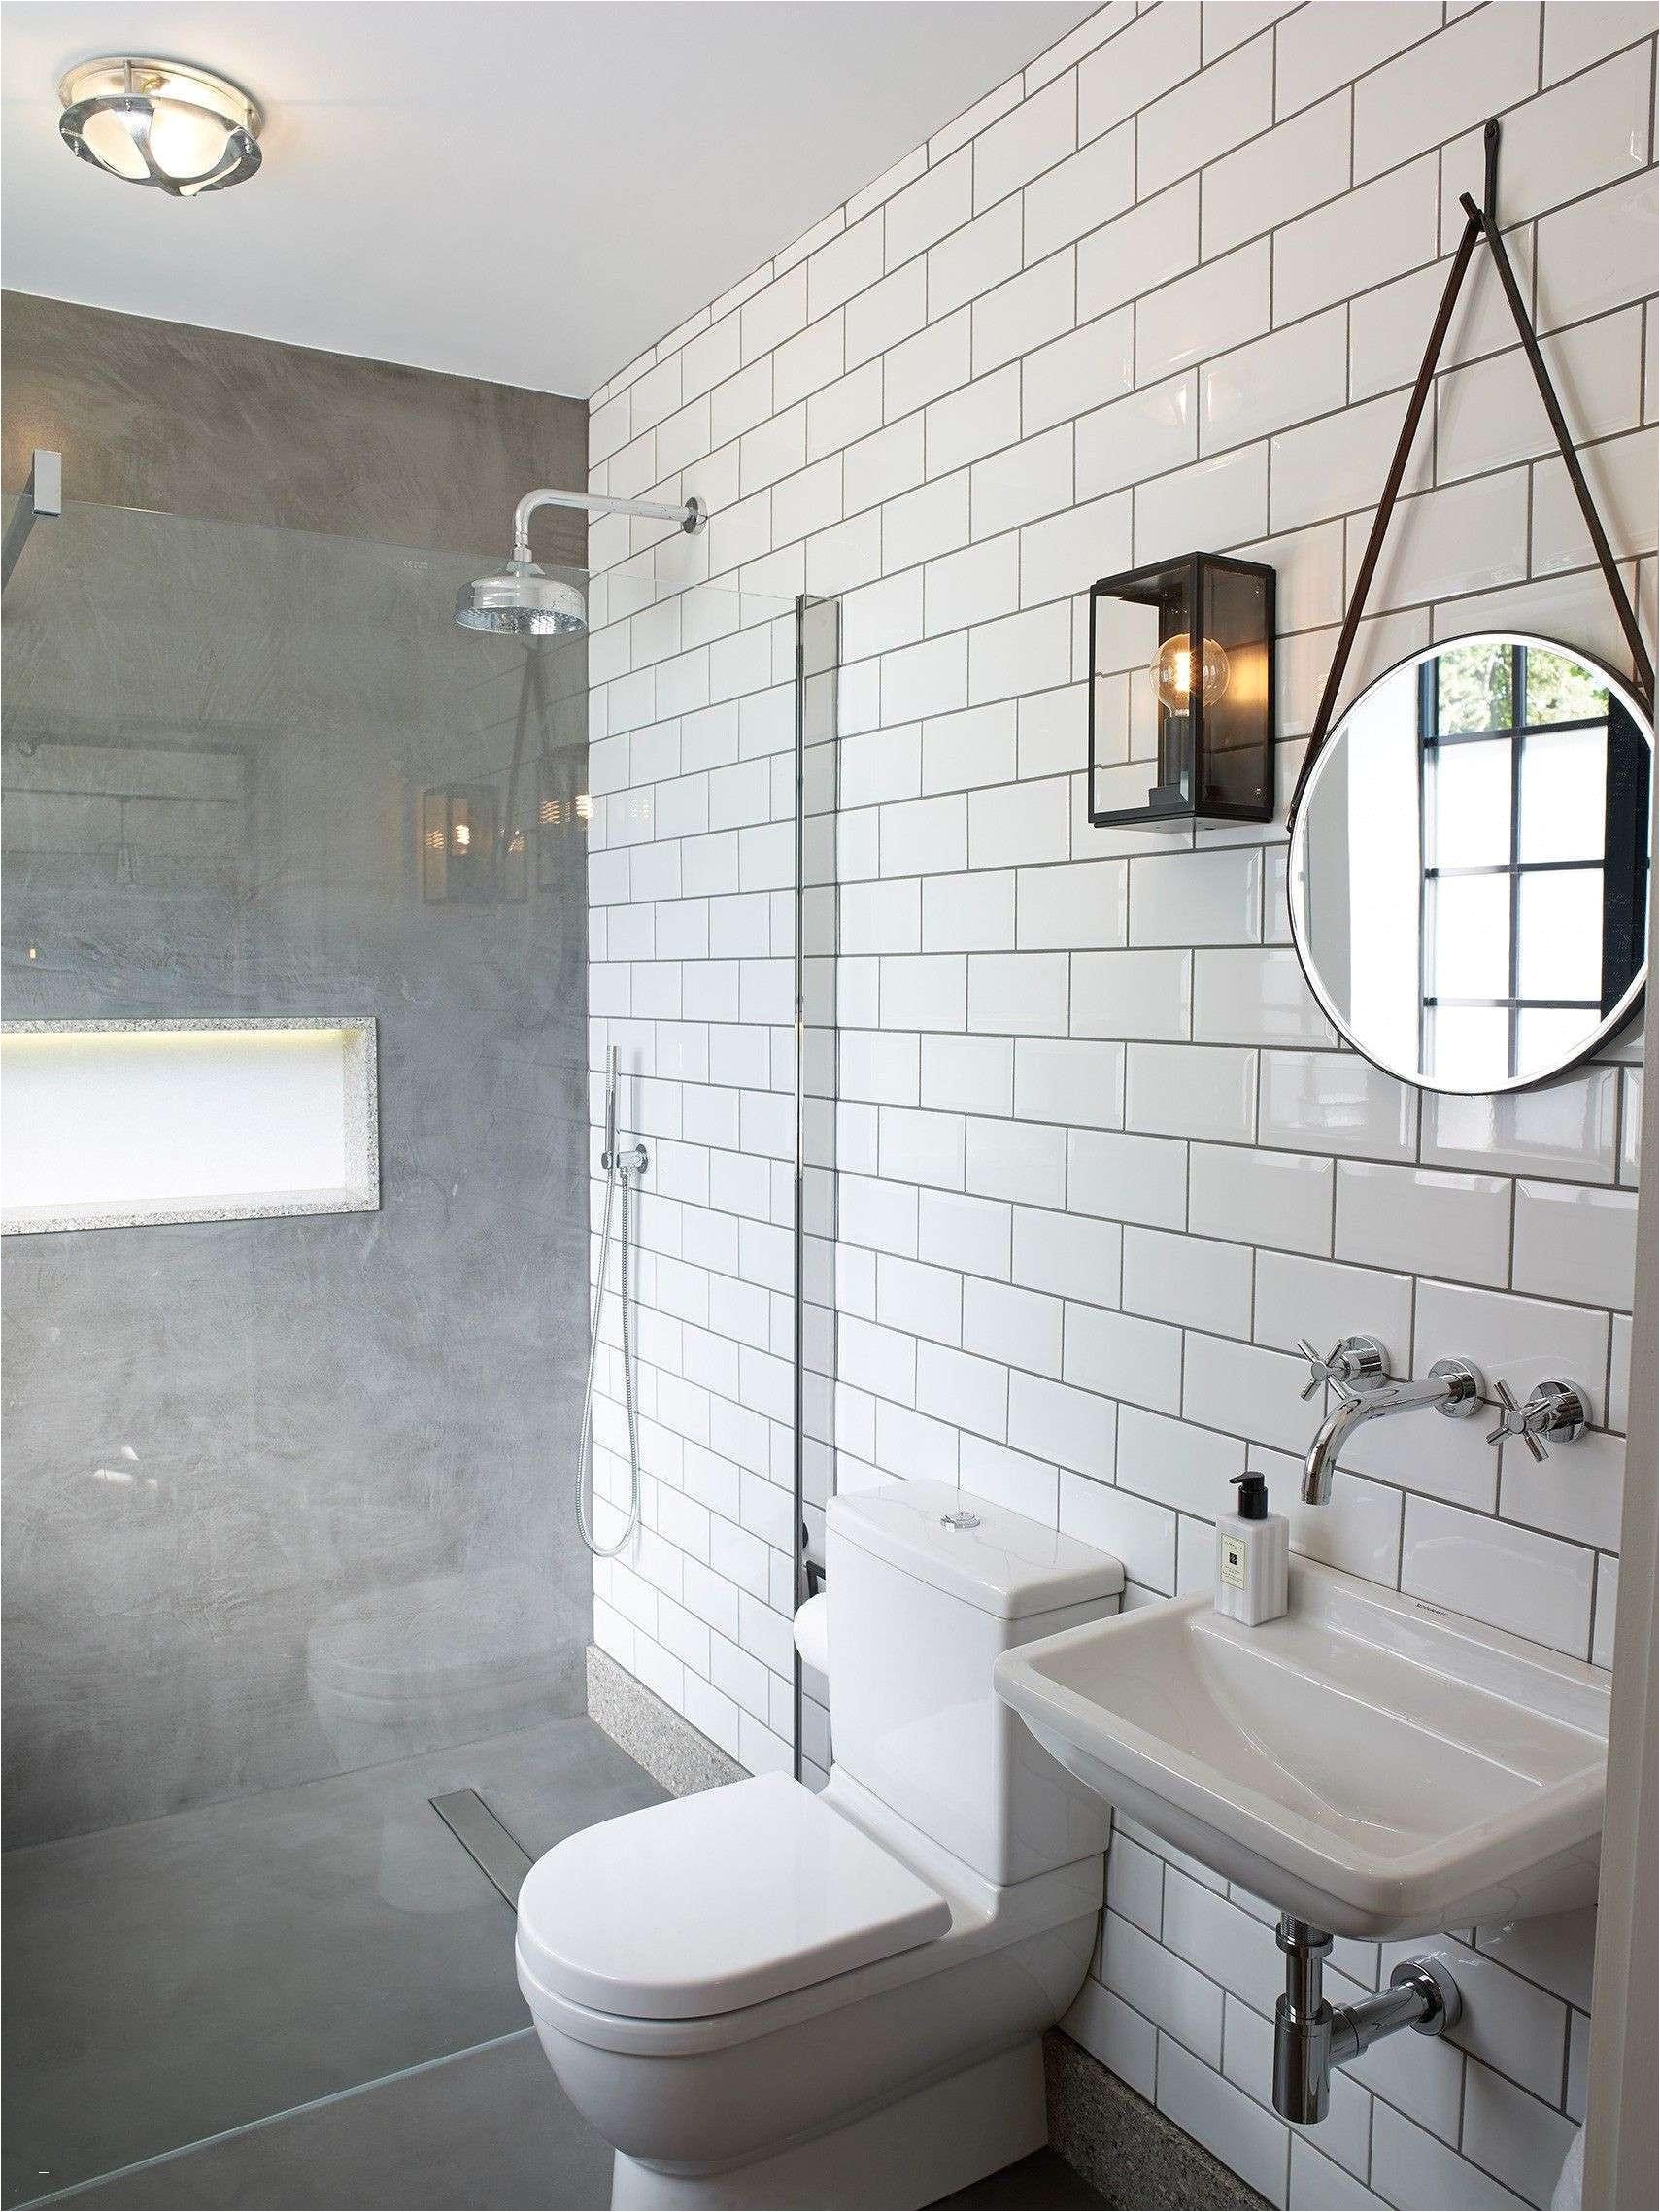 shower tub surround fresh bathroom wall decor ideas incredible tag toilet ideas 0d mucsat